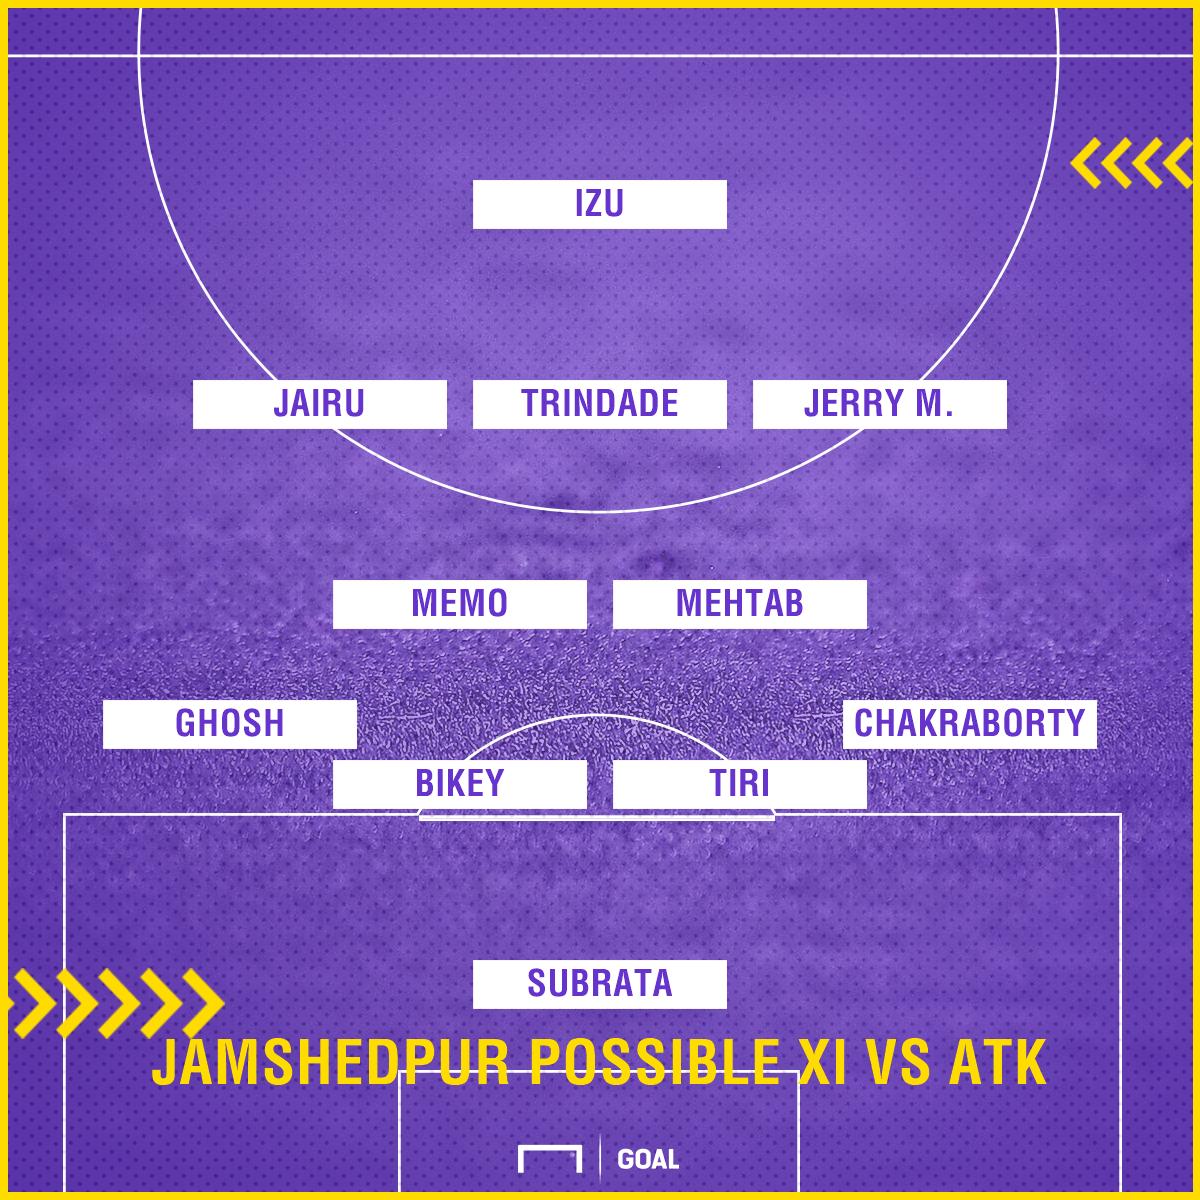 Jamshedpur possible XI vs ATK